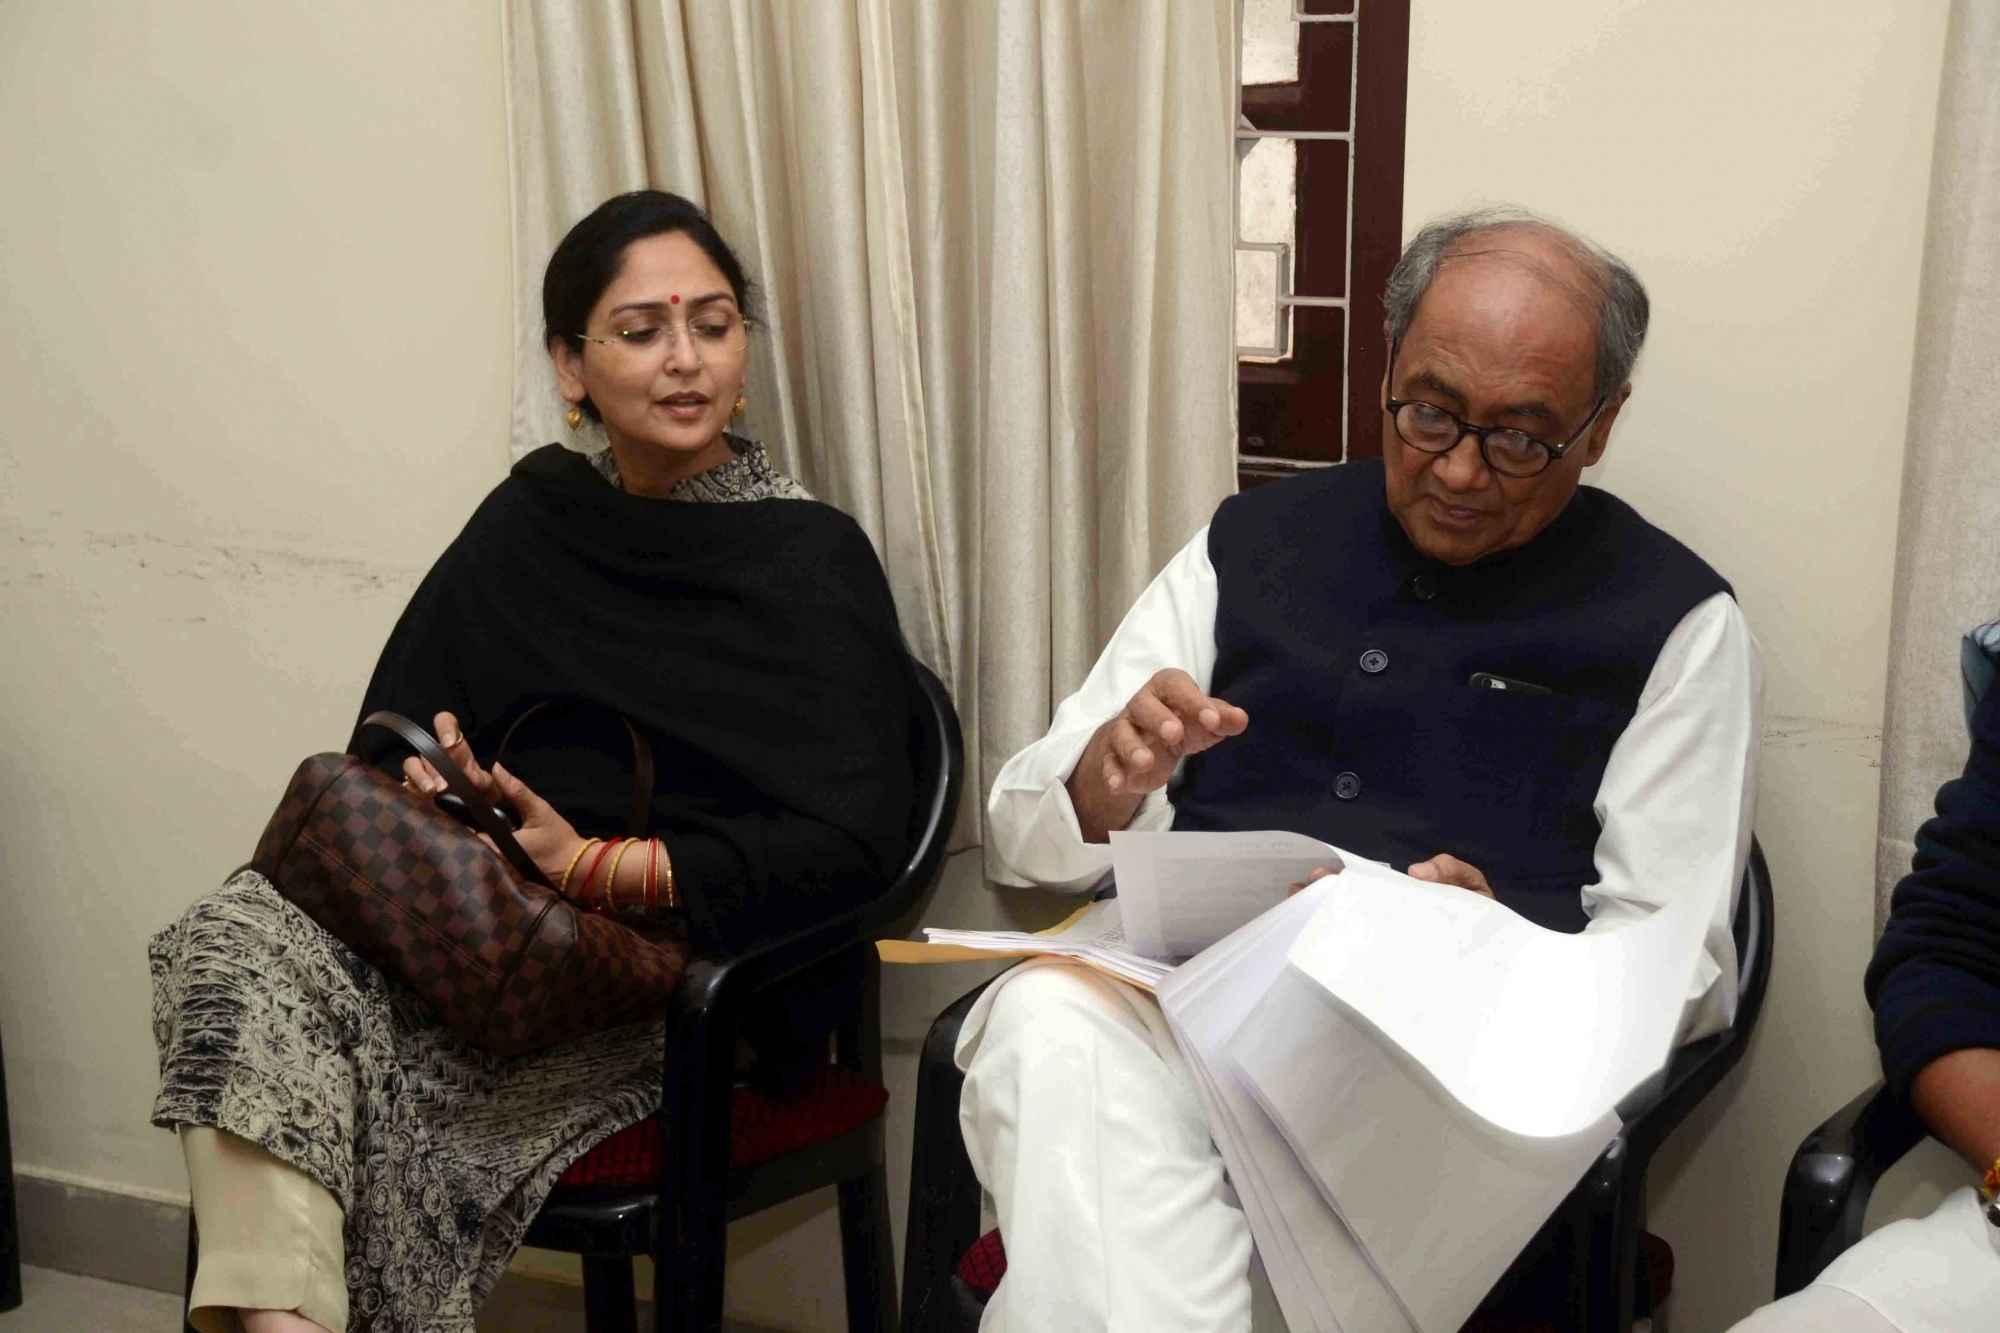 Patna: Congress leader Digvijay Singh and Amrita Rai in Patna on Dec 4, 2016. (Photo: IANS)